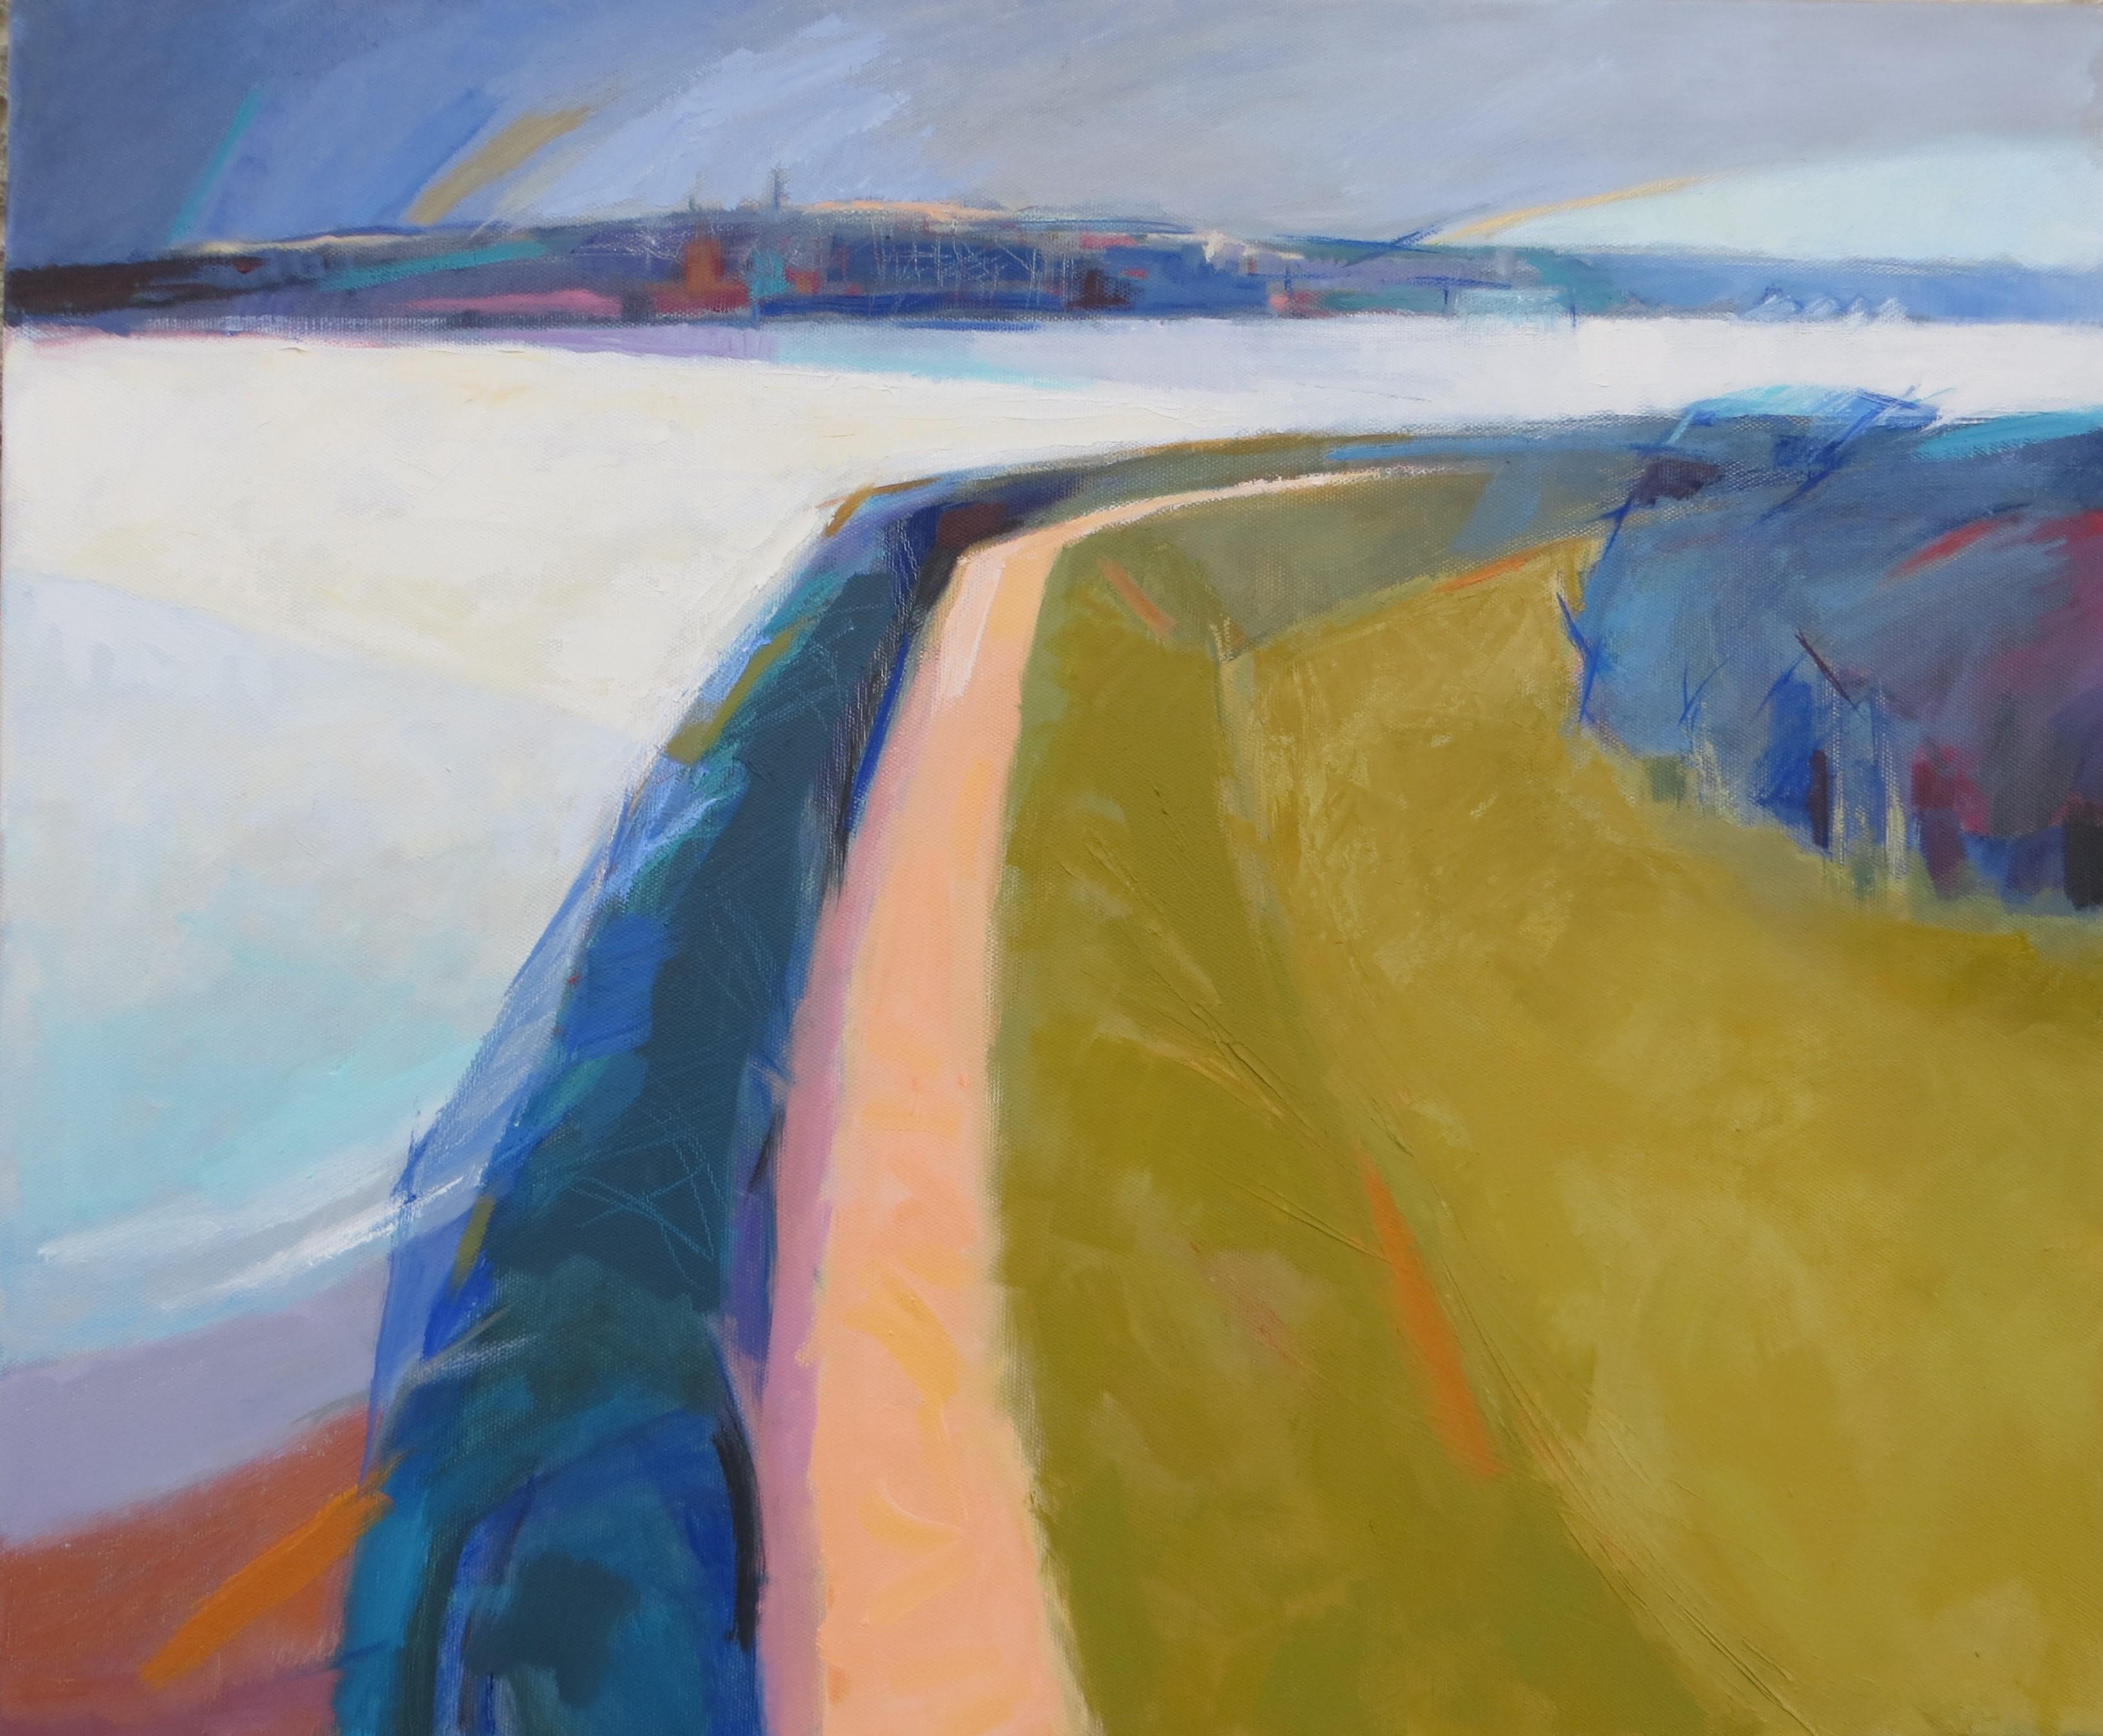 Towards Maldon